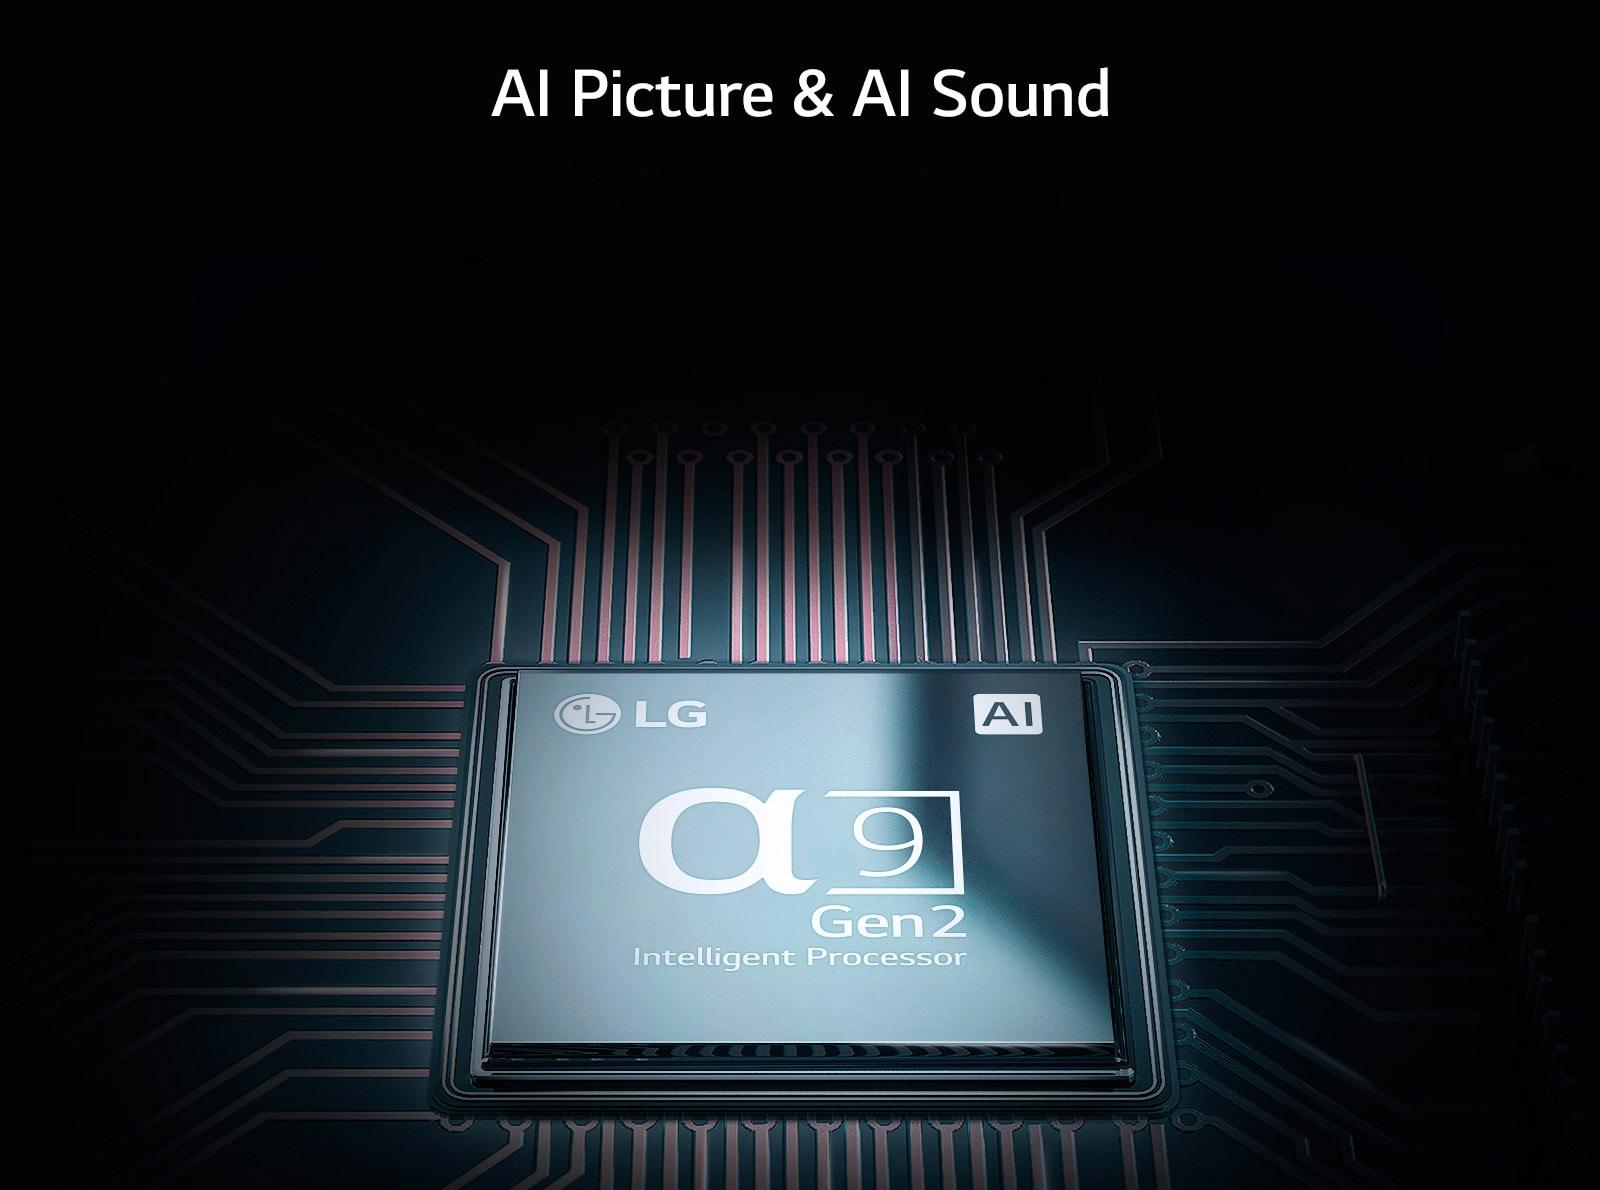 TV-OLED-C9-01-Alpha9-Gen-2-Desktop